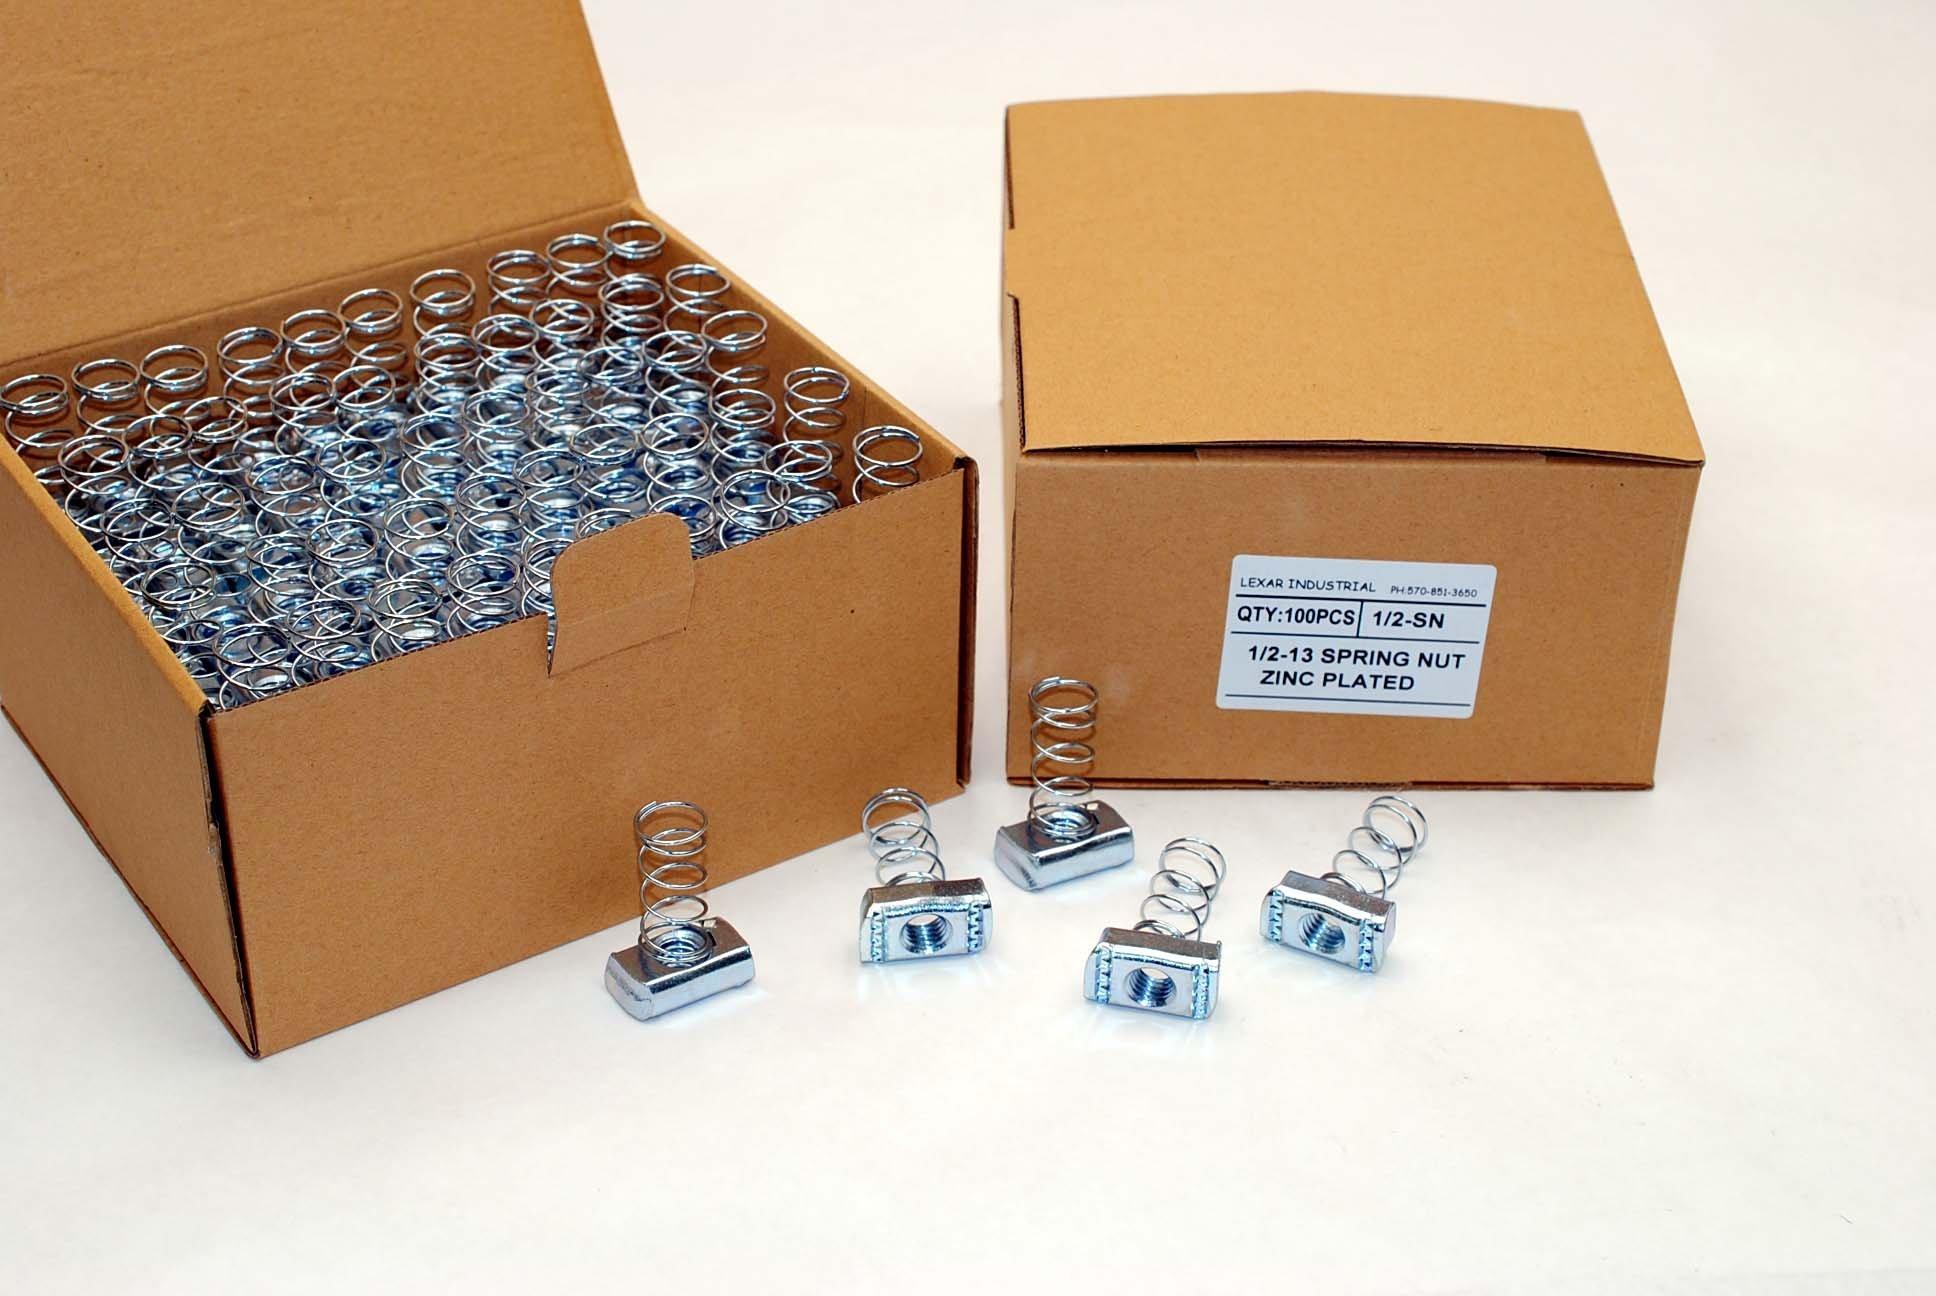 (100) Strut Channel Nuts 1/2-13 Standard Spring Zinc Plated Unistrut Nut by Lexar Industrial